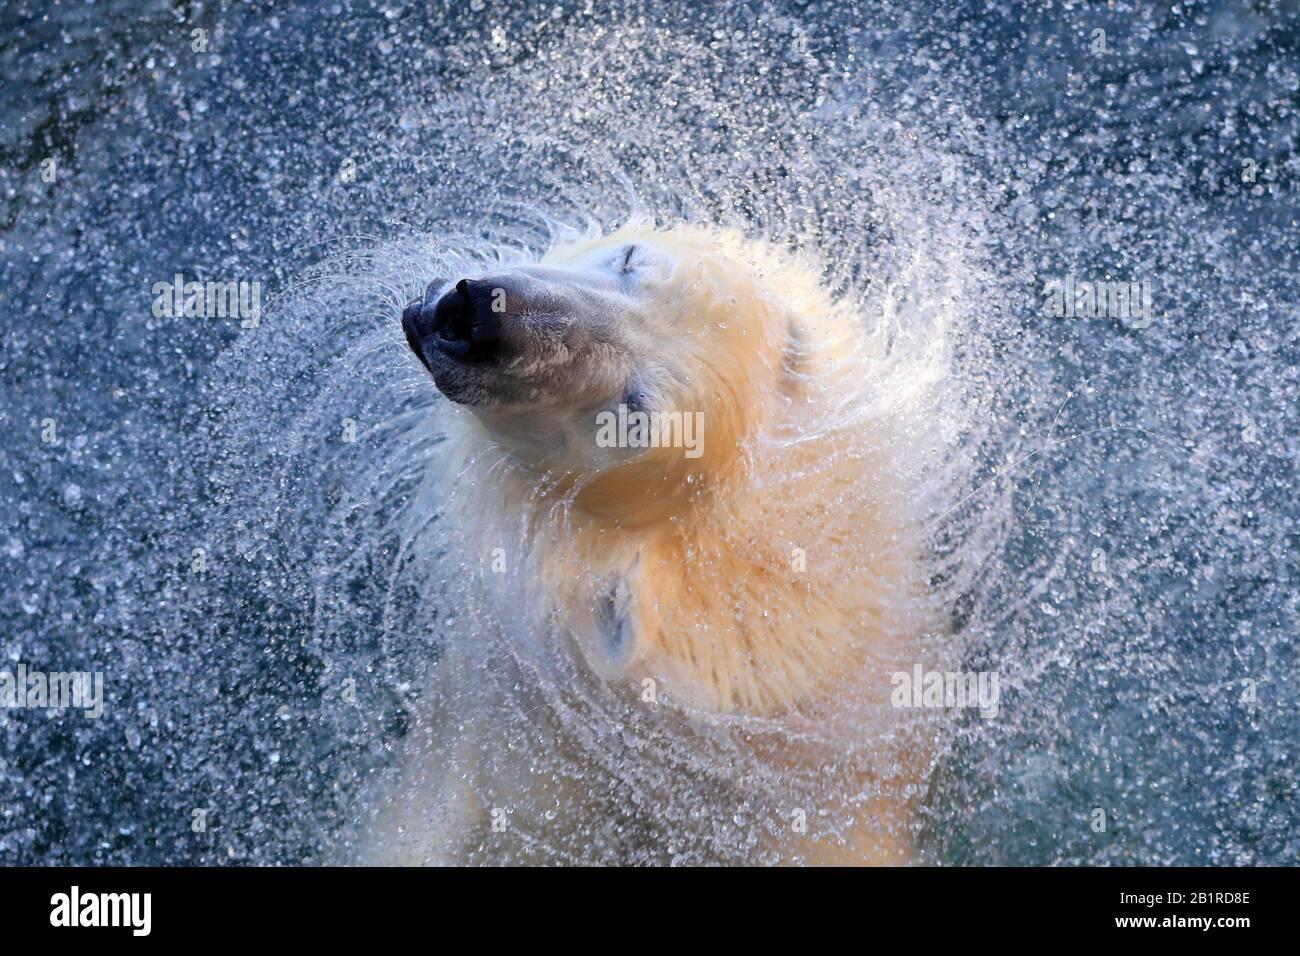 St Petersburg, Russia. 27th Feb, 2020. ST PETERSBURG, RUSSIA - FEBRUARY 27, 2020: A polar bear at Leningrad Zoo. February 27 is International Polar Bear Day. Peter Kovalev/TASS Credit: ITAR-TASS News Agency/Alamy Live News Stock Photo